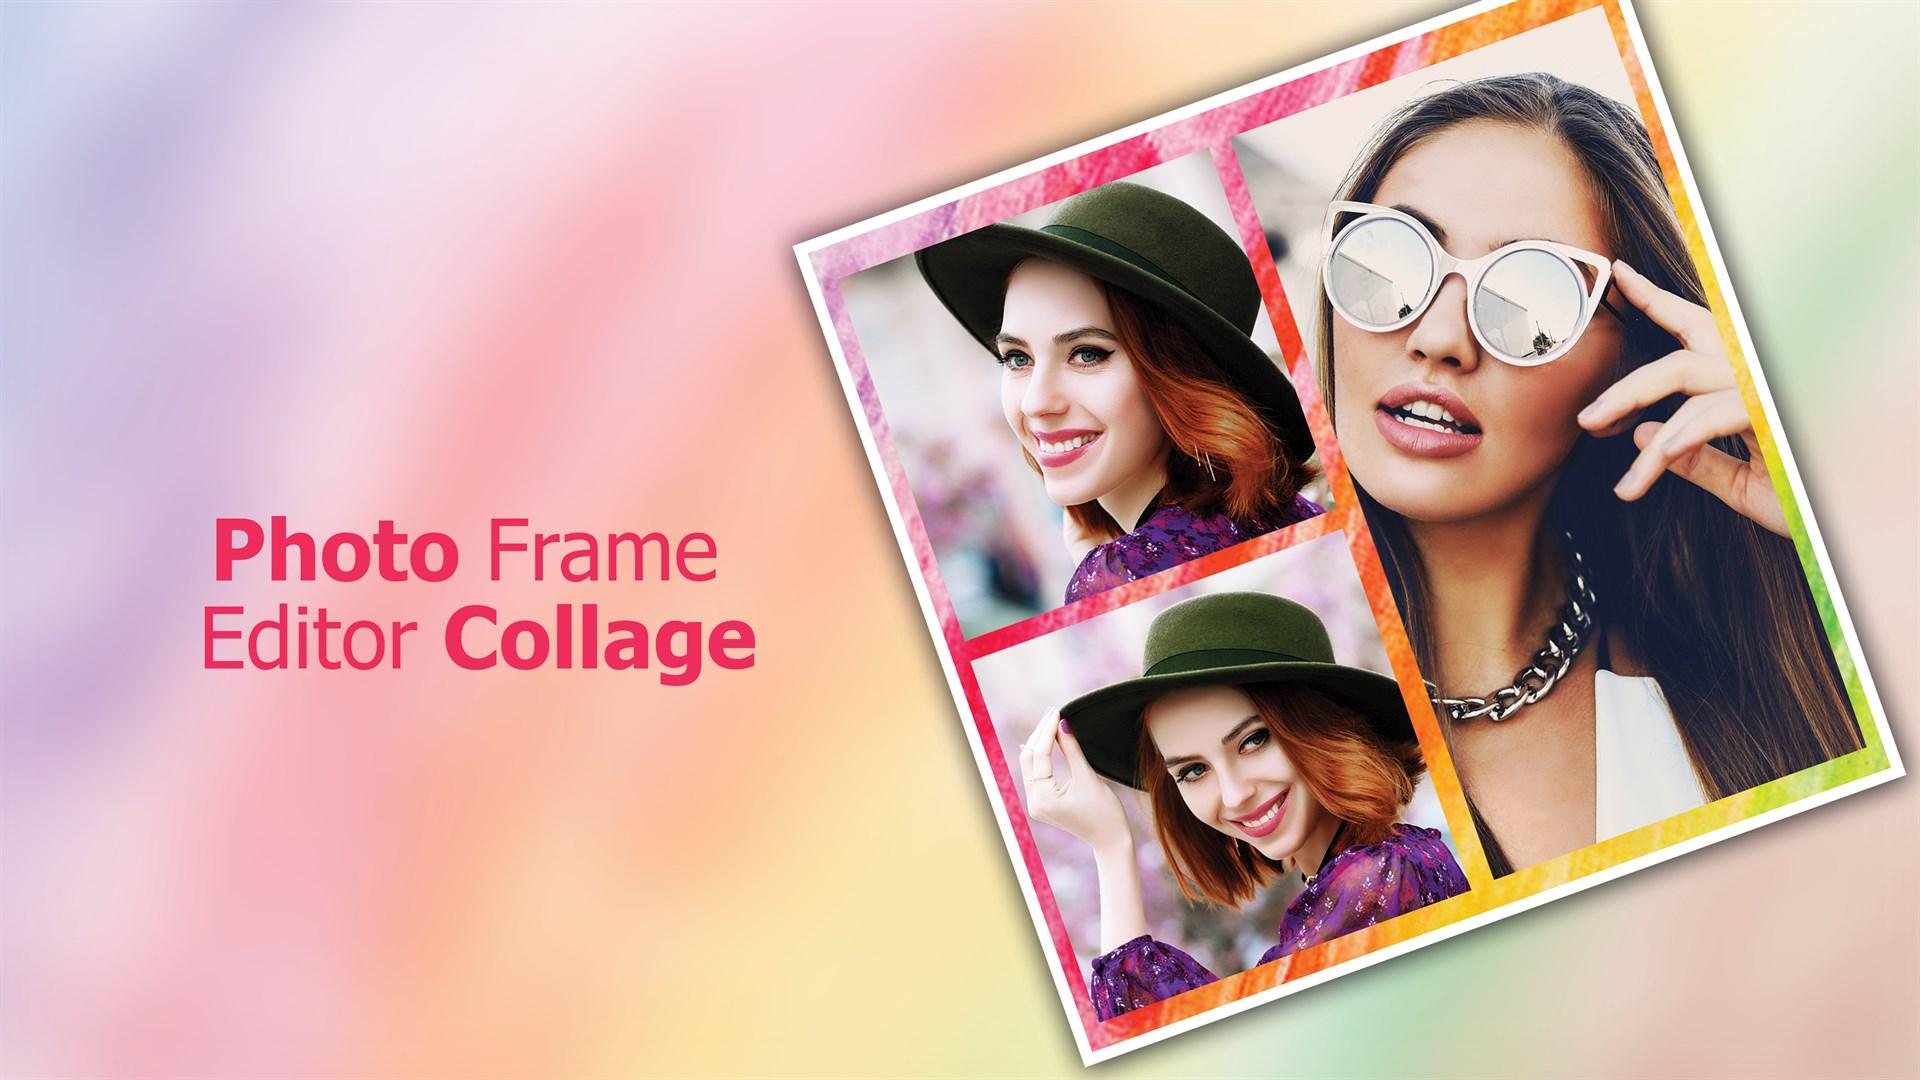 Get photo frame editor collage microsoft store izmirmasajfo